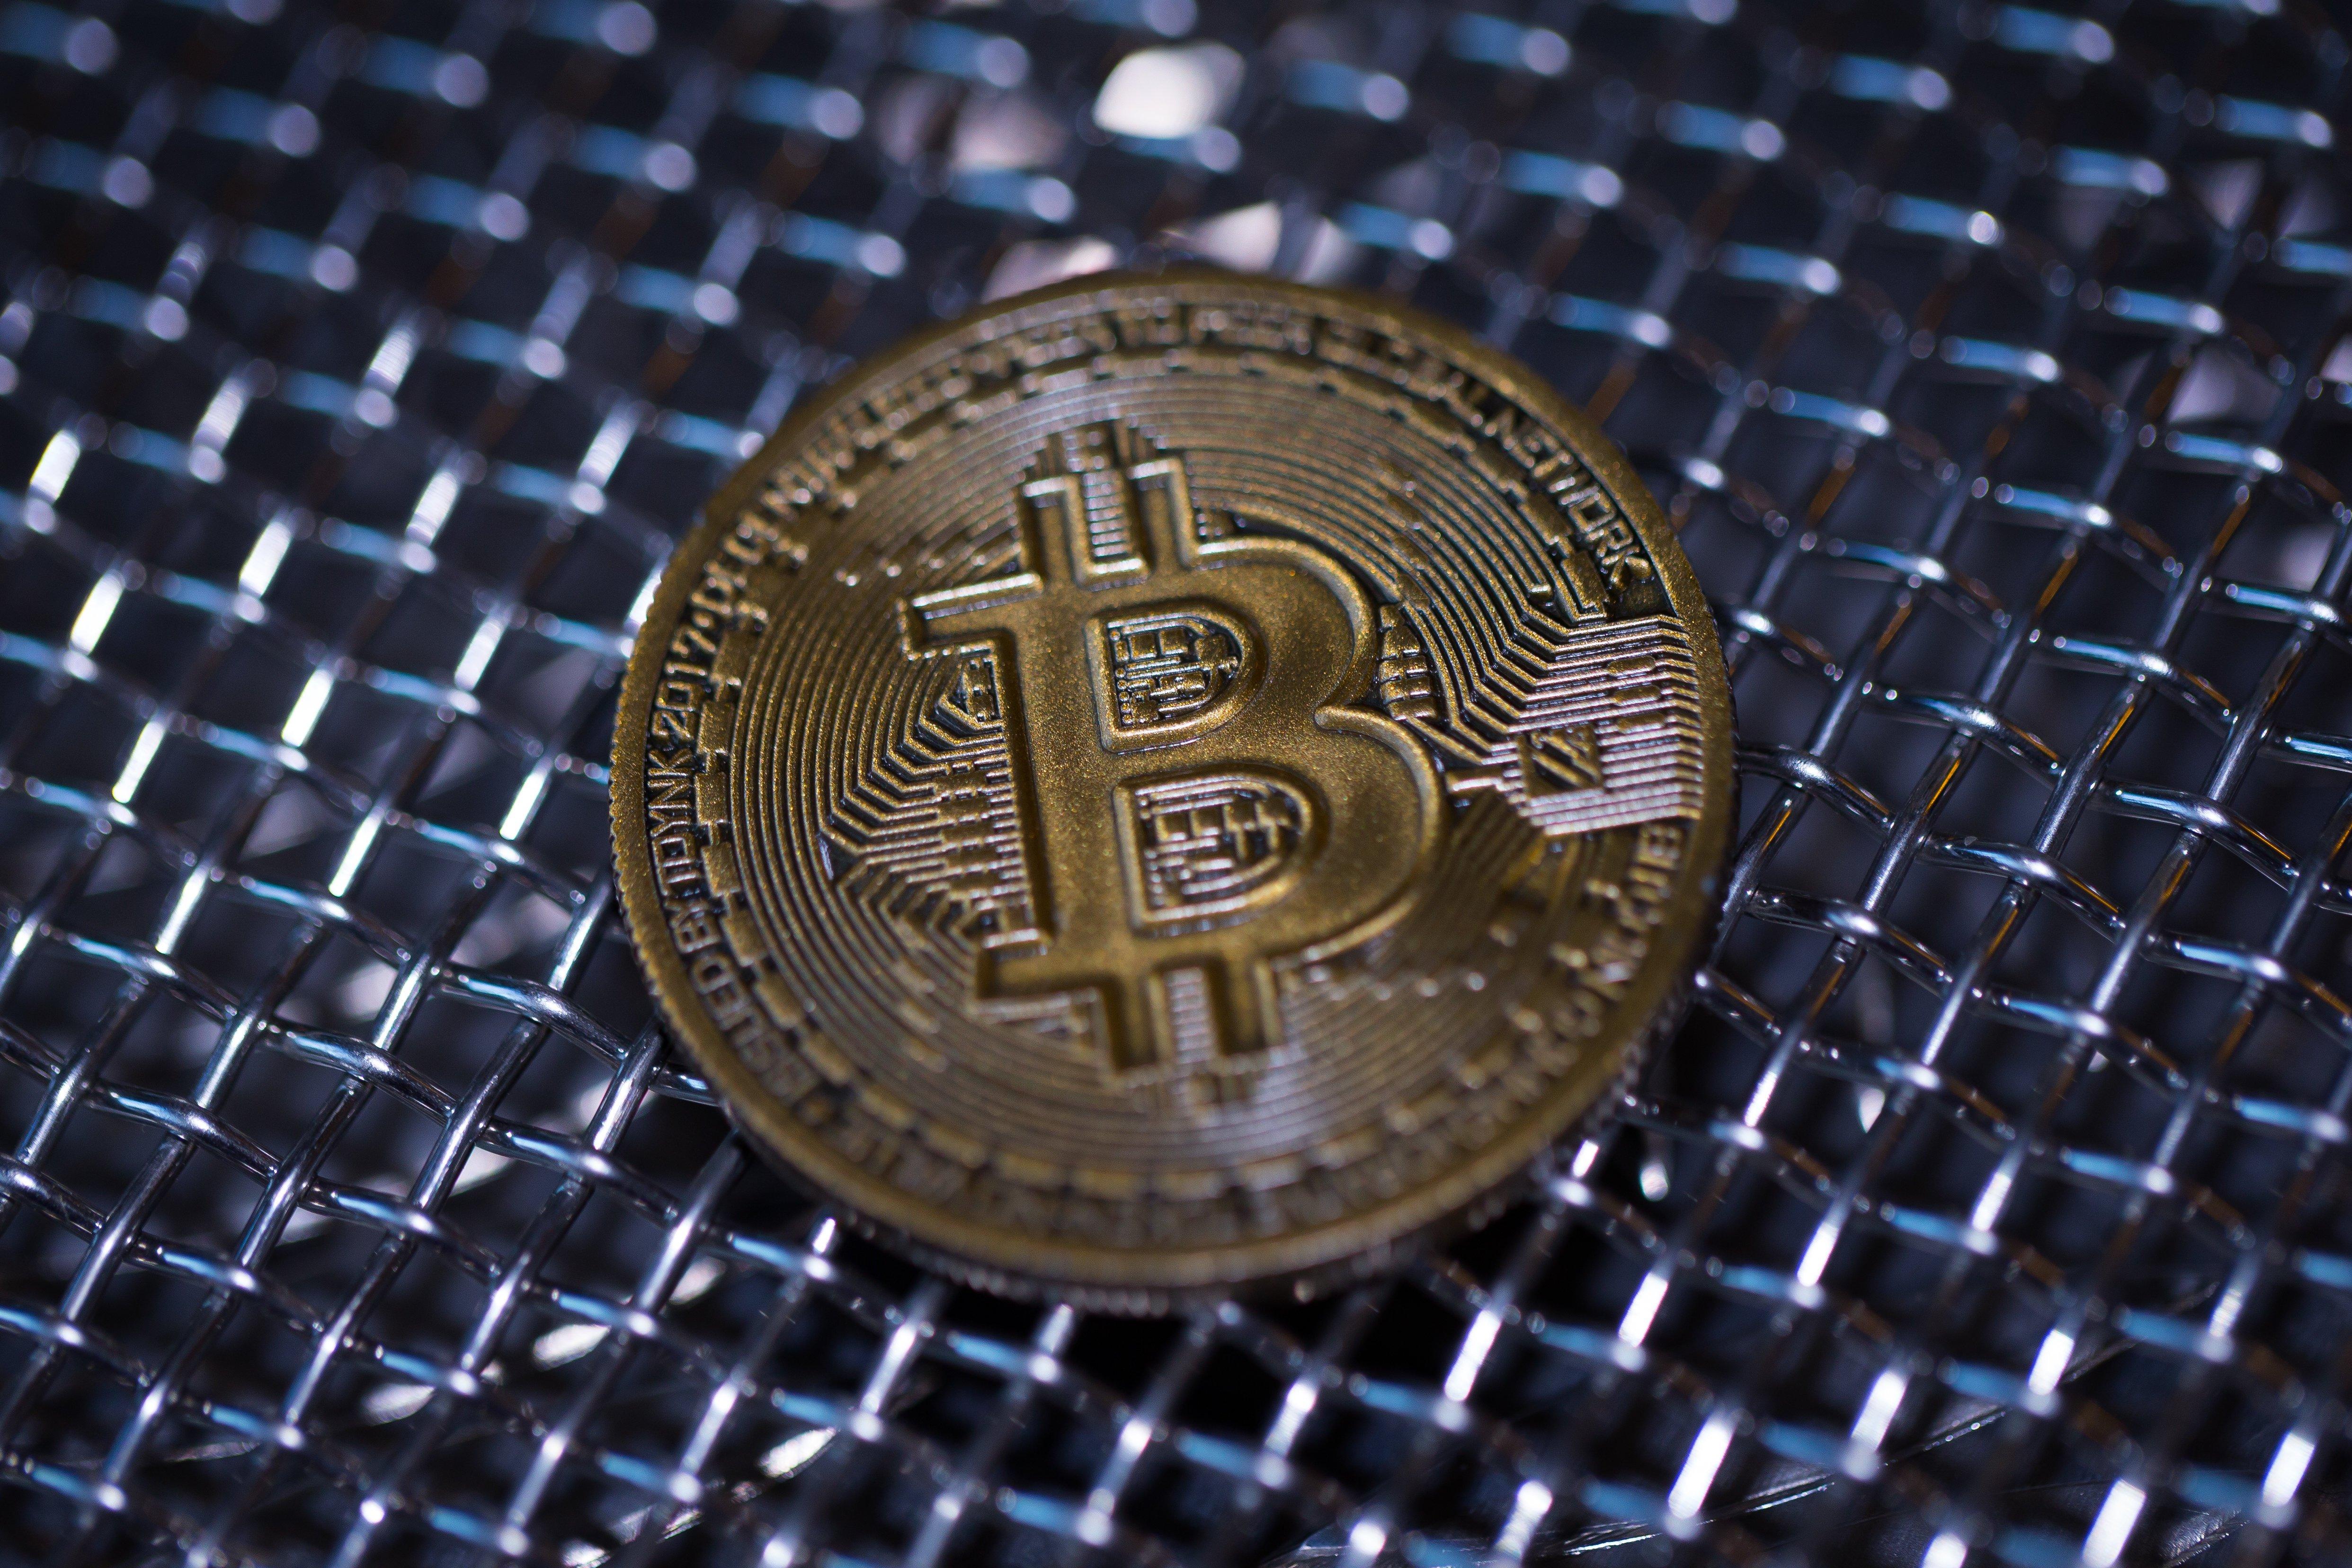 MarketSpots Review – Is MarketSpots Scam or a Legit Crypto Broker?